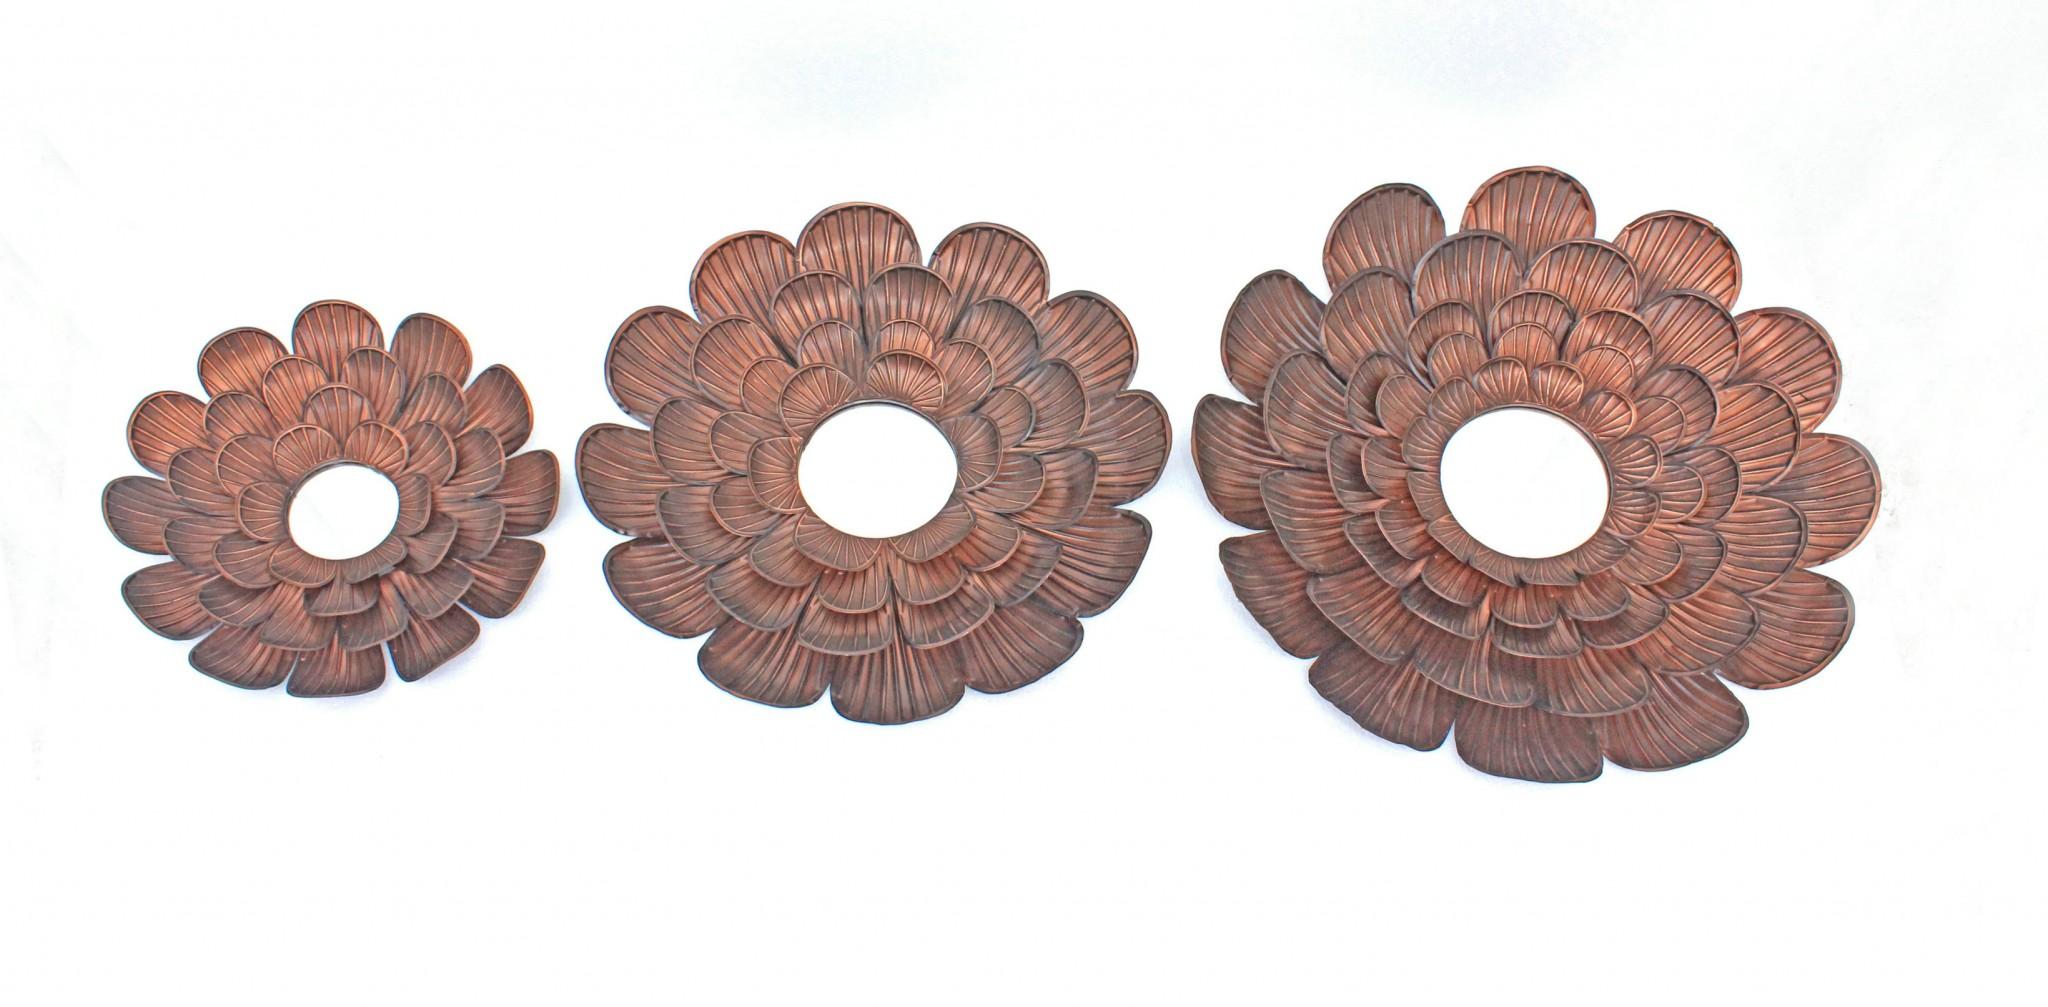 "31"" x 31"" x 3.5"" Copper, 3 Piece, Vintage, Blooming Flower, Metal - Wall Mirror"